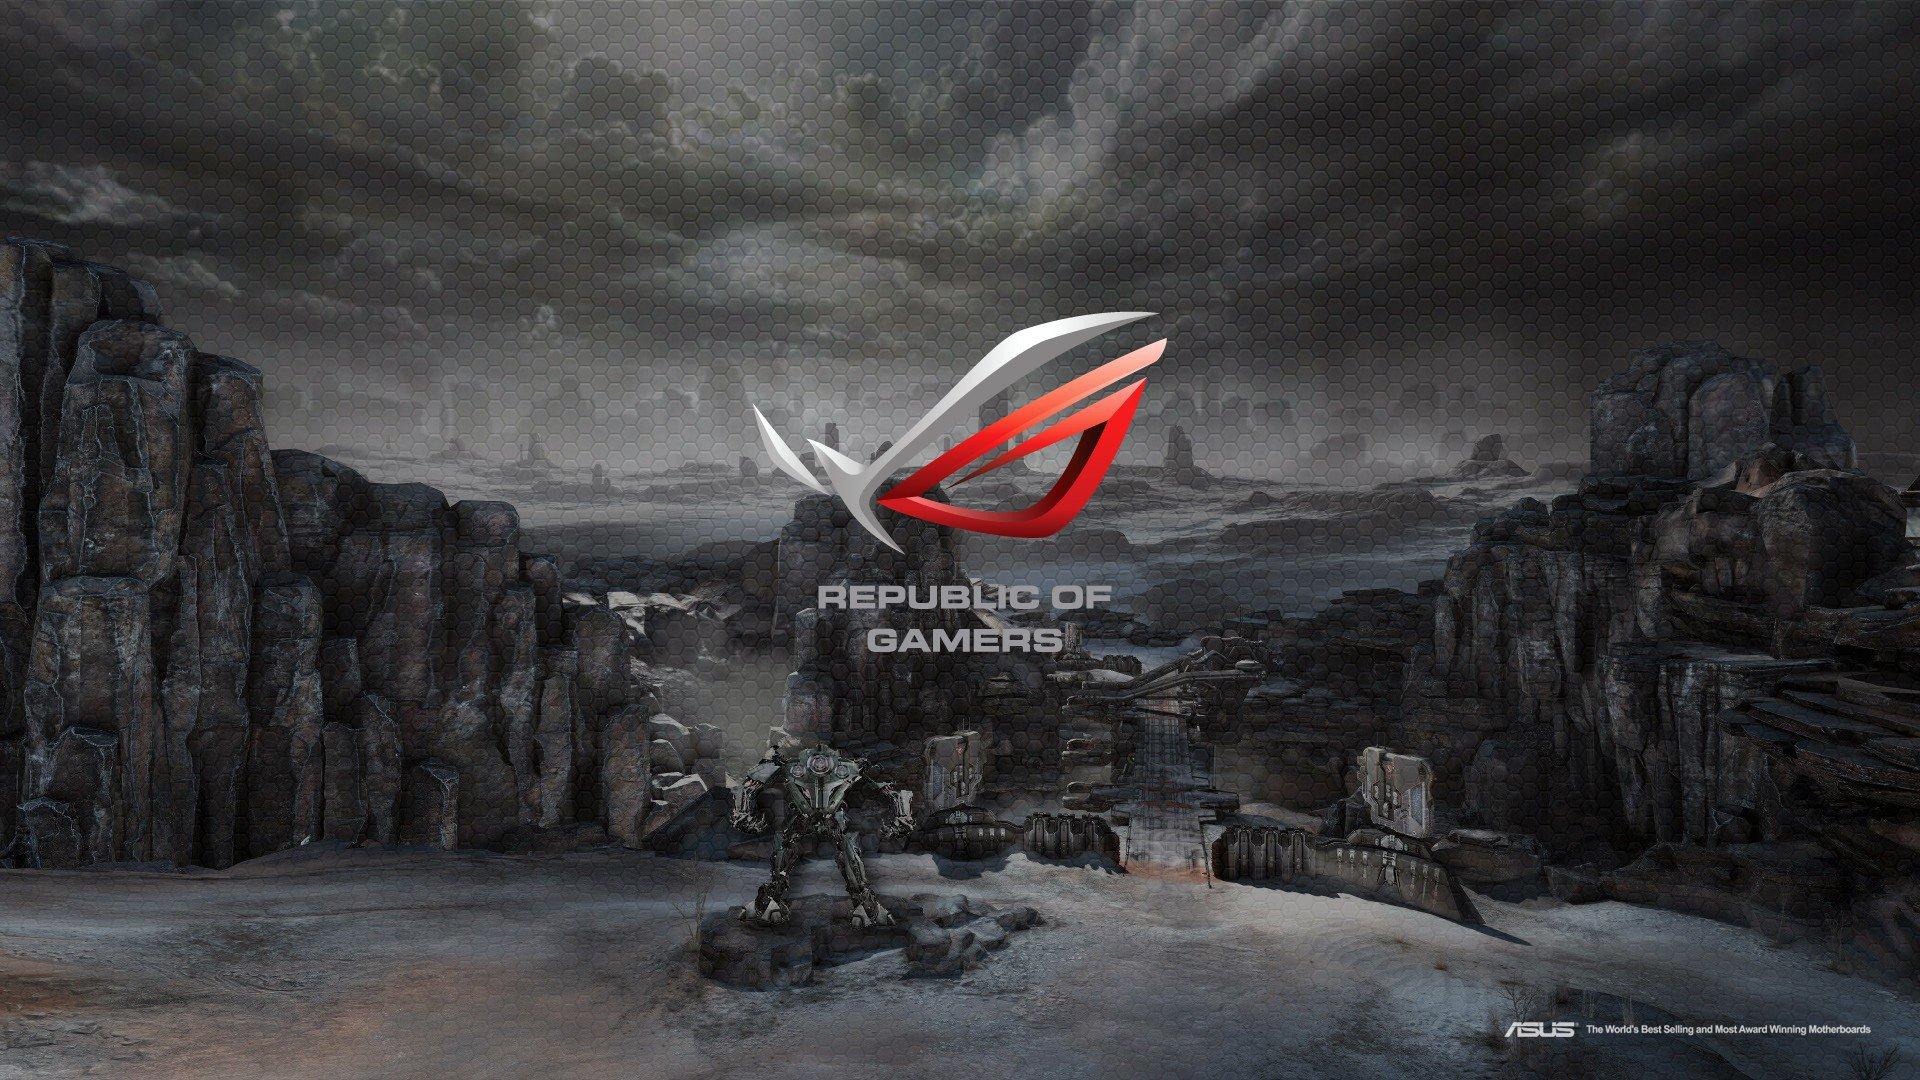 Republic Of Gamers Wallpaper - Asus Rog Full Hd , HD Wallpaper & Backgrounds